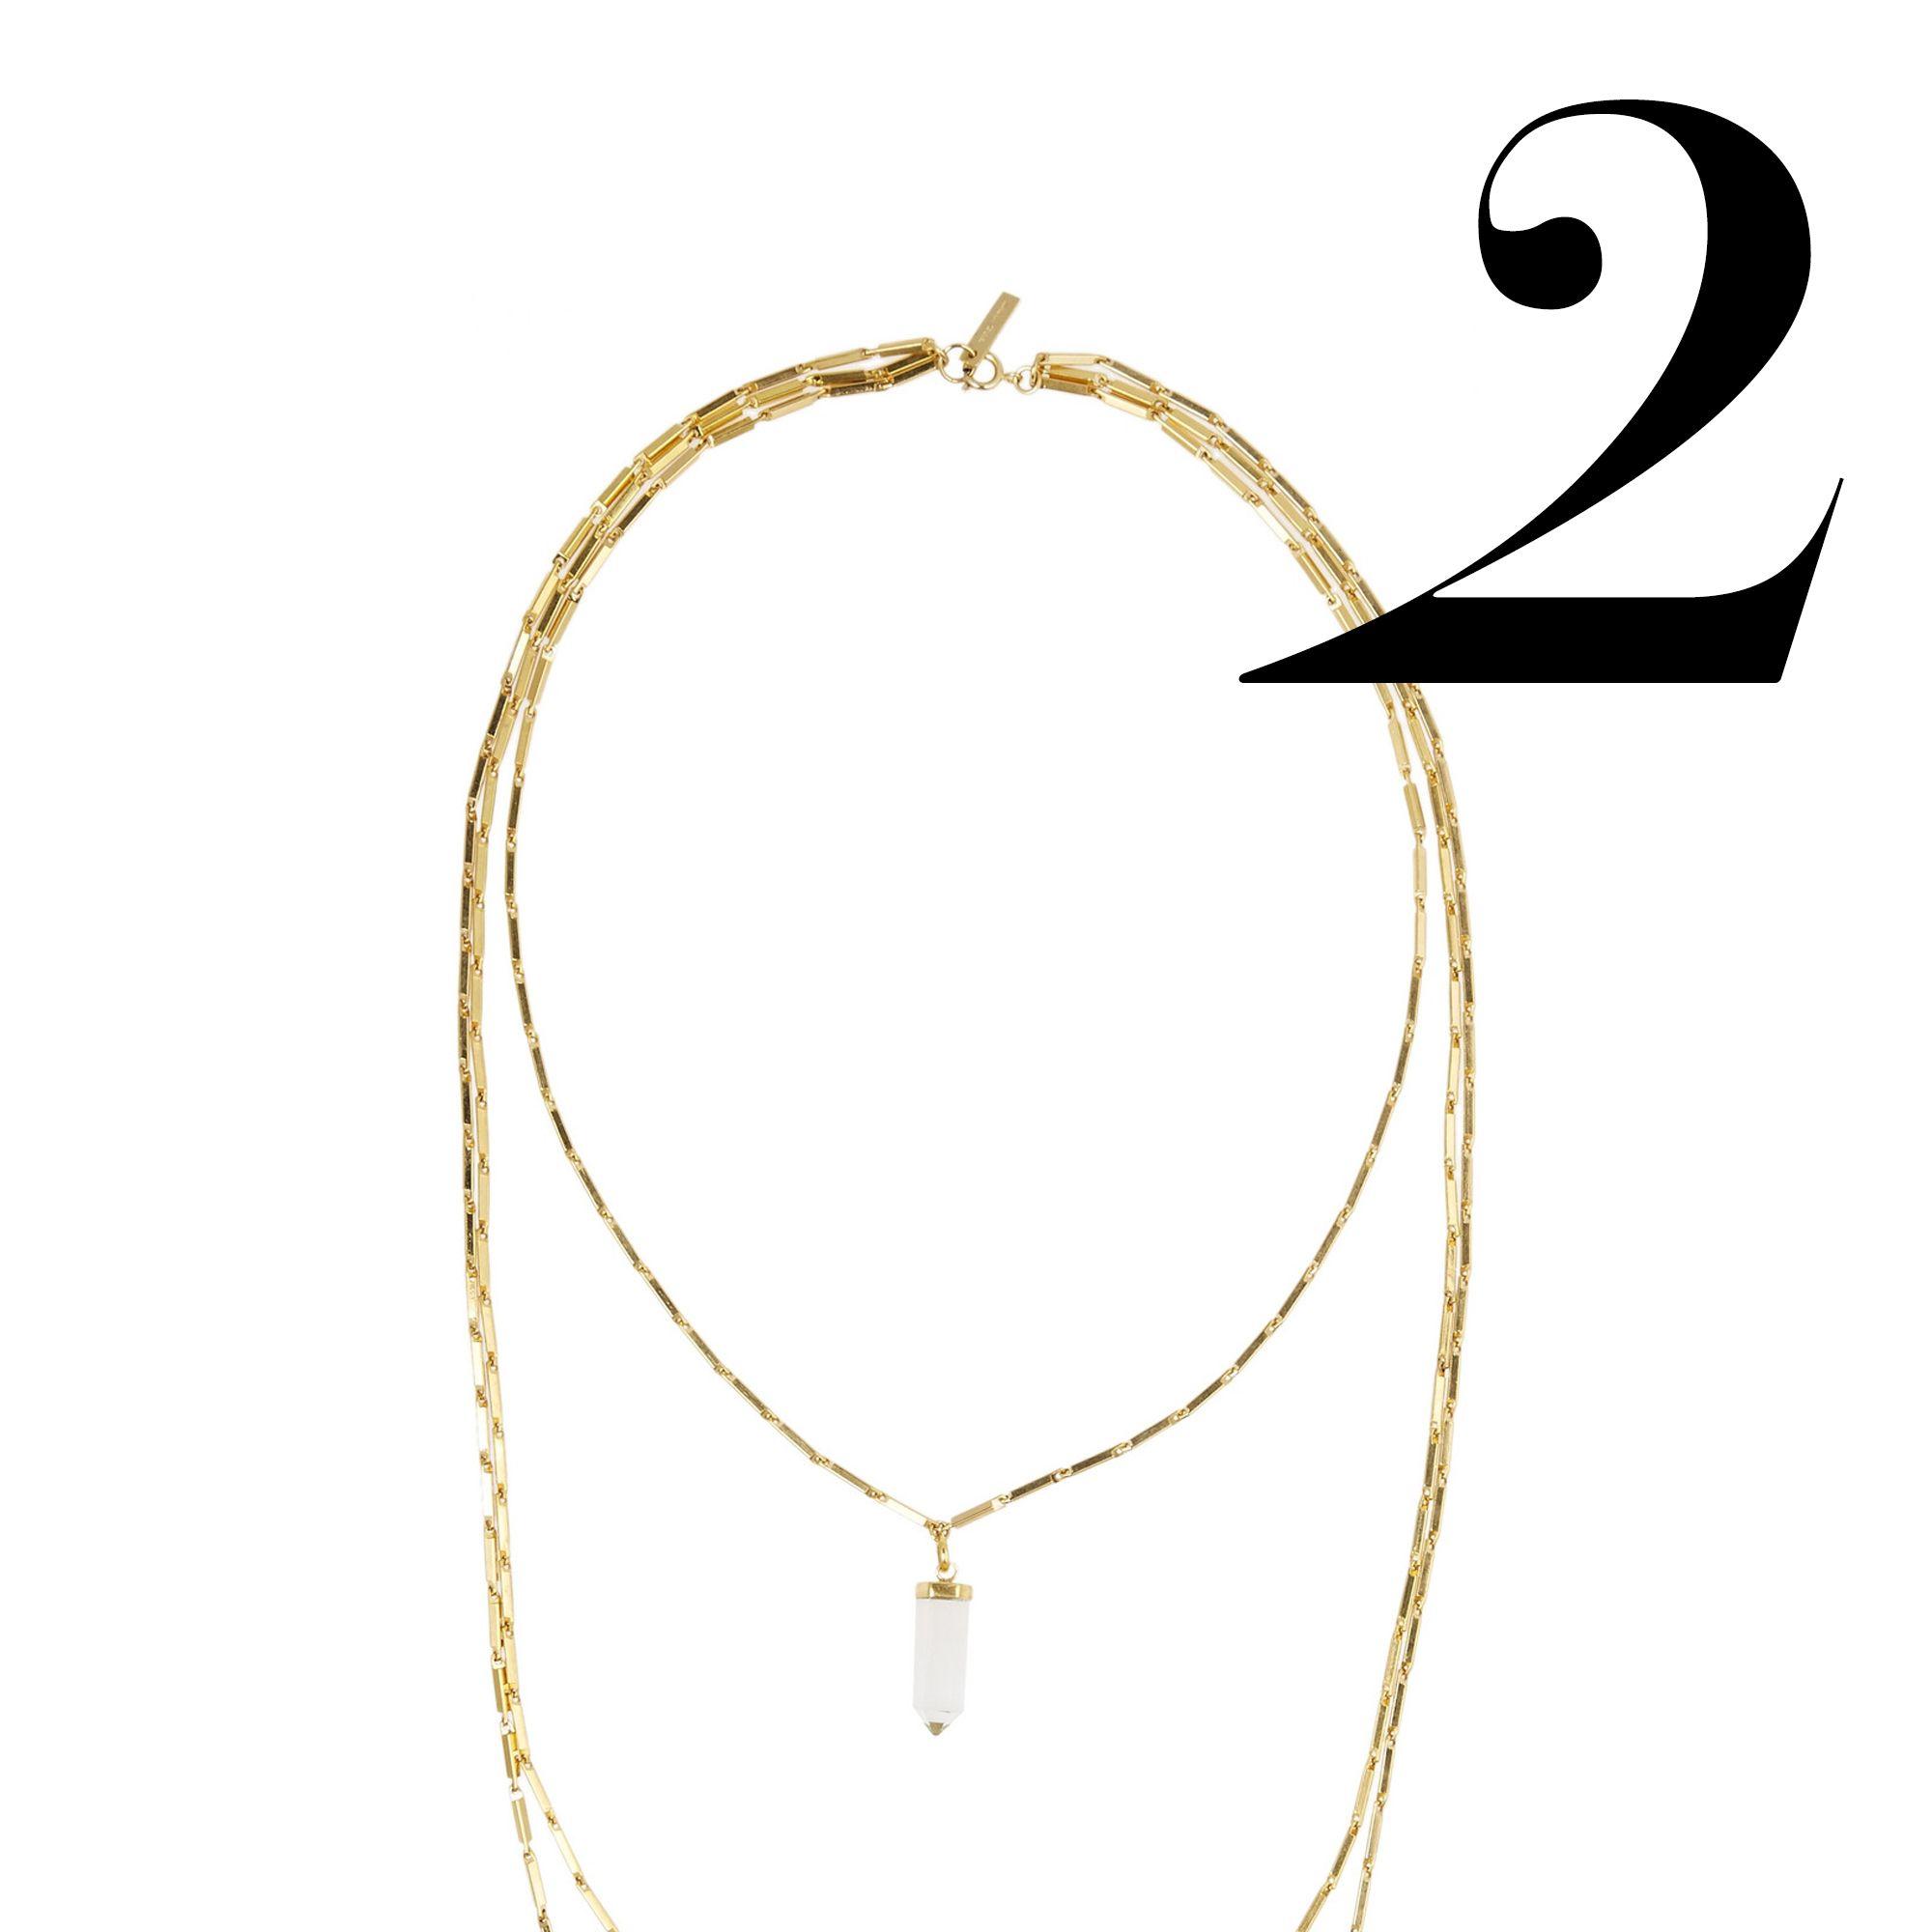 "<em>Isabel Marant necklace, $228, <a href=""http://www.theoutnet.com/en-US/product/Isabel-Marant/New-Day-gold-tone-crystal-necklace/528067"" target=""_blank"">theoutnet.com</a>.</em>"